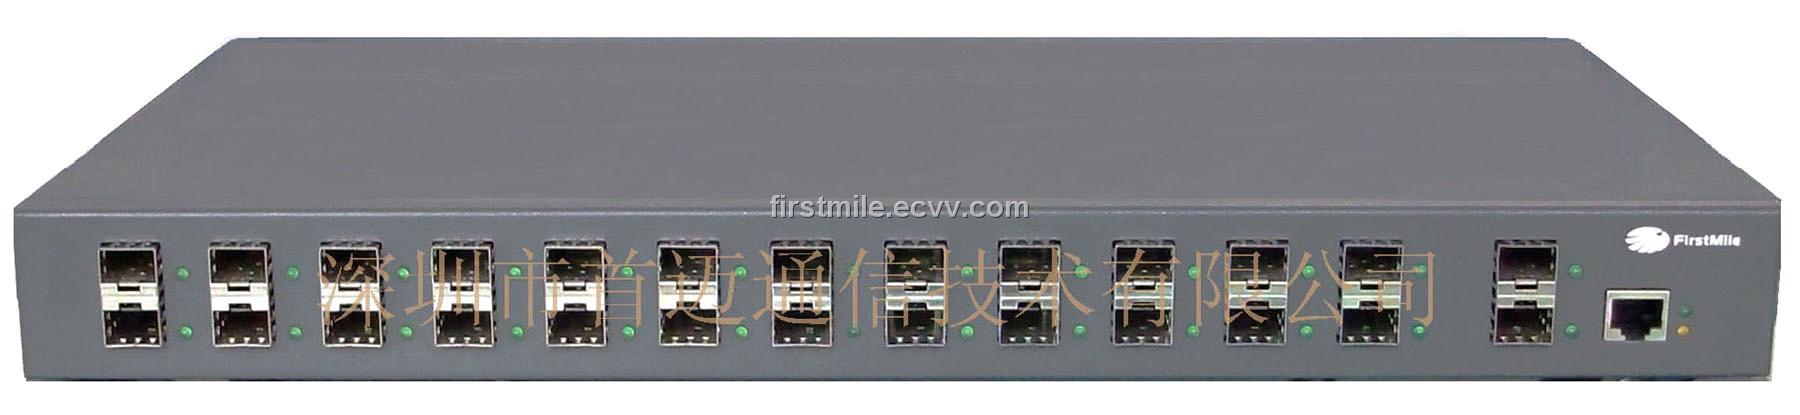 26 Gigabit Ports Managed Sfp Based Fiber Optic Ethernet